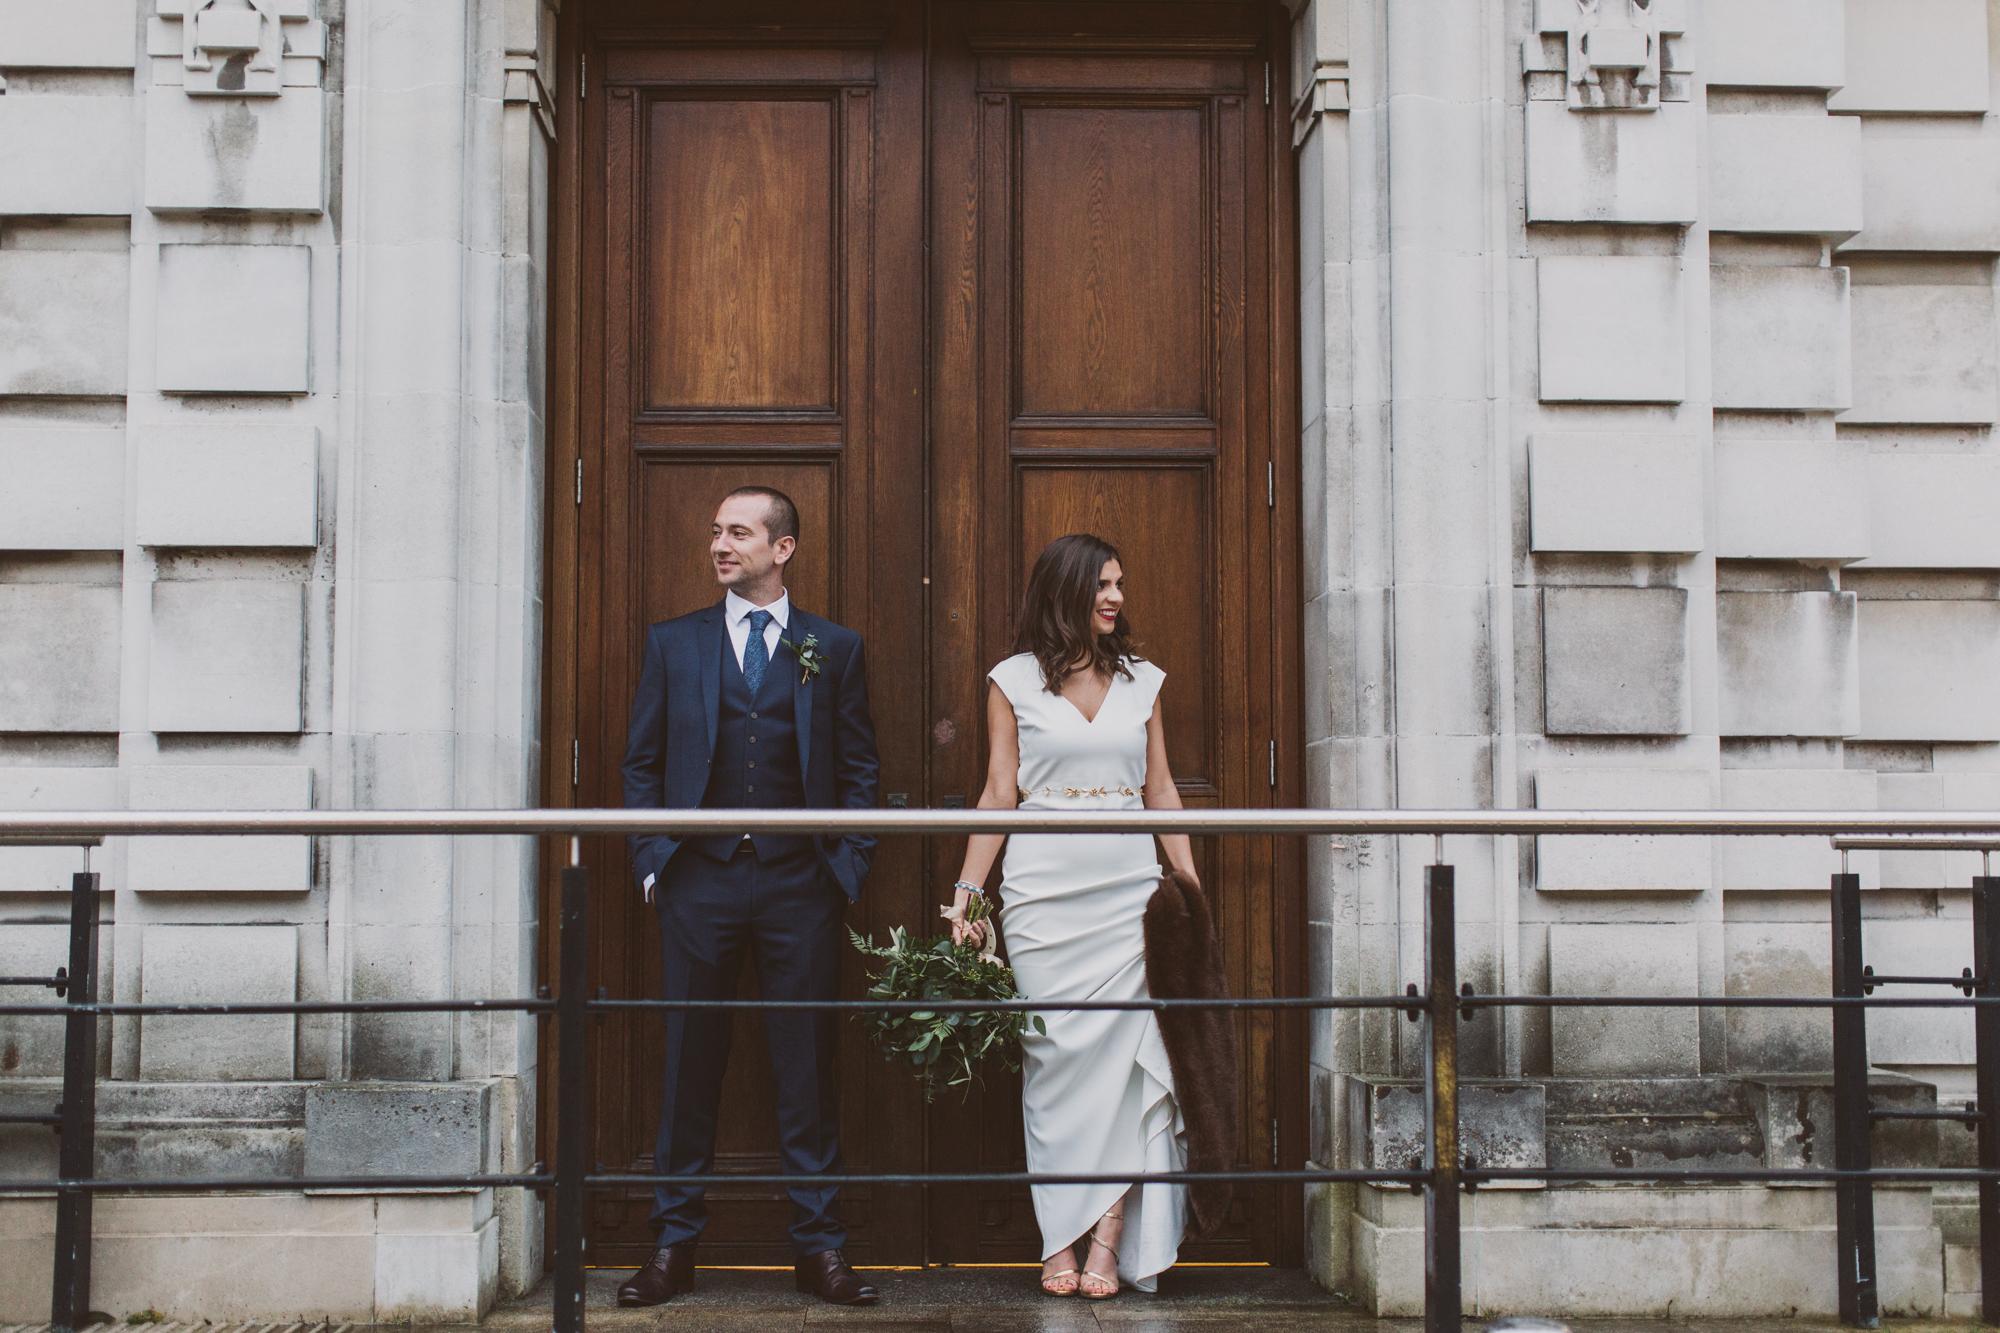 City_Centre_northern_ireland_wedding_inspire_weddings_19.jpg